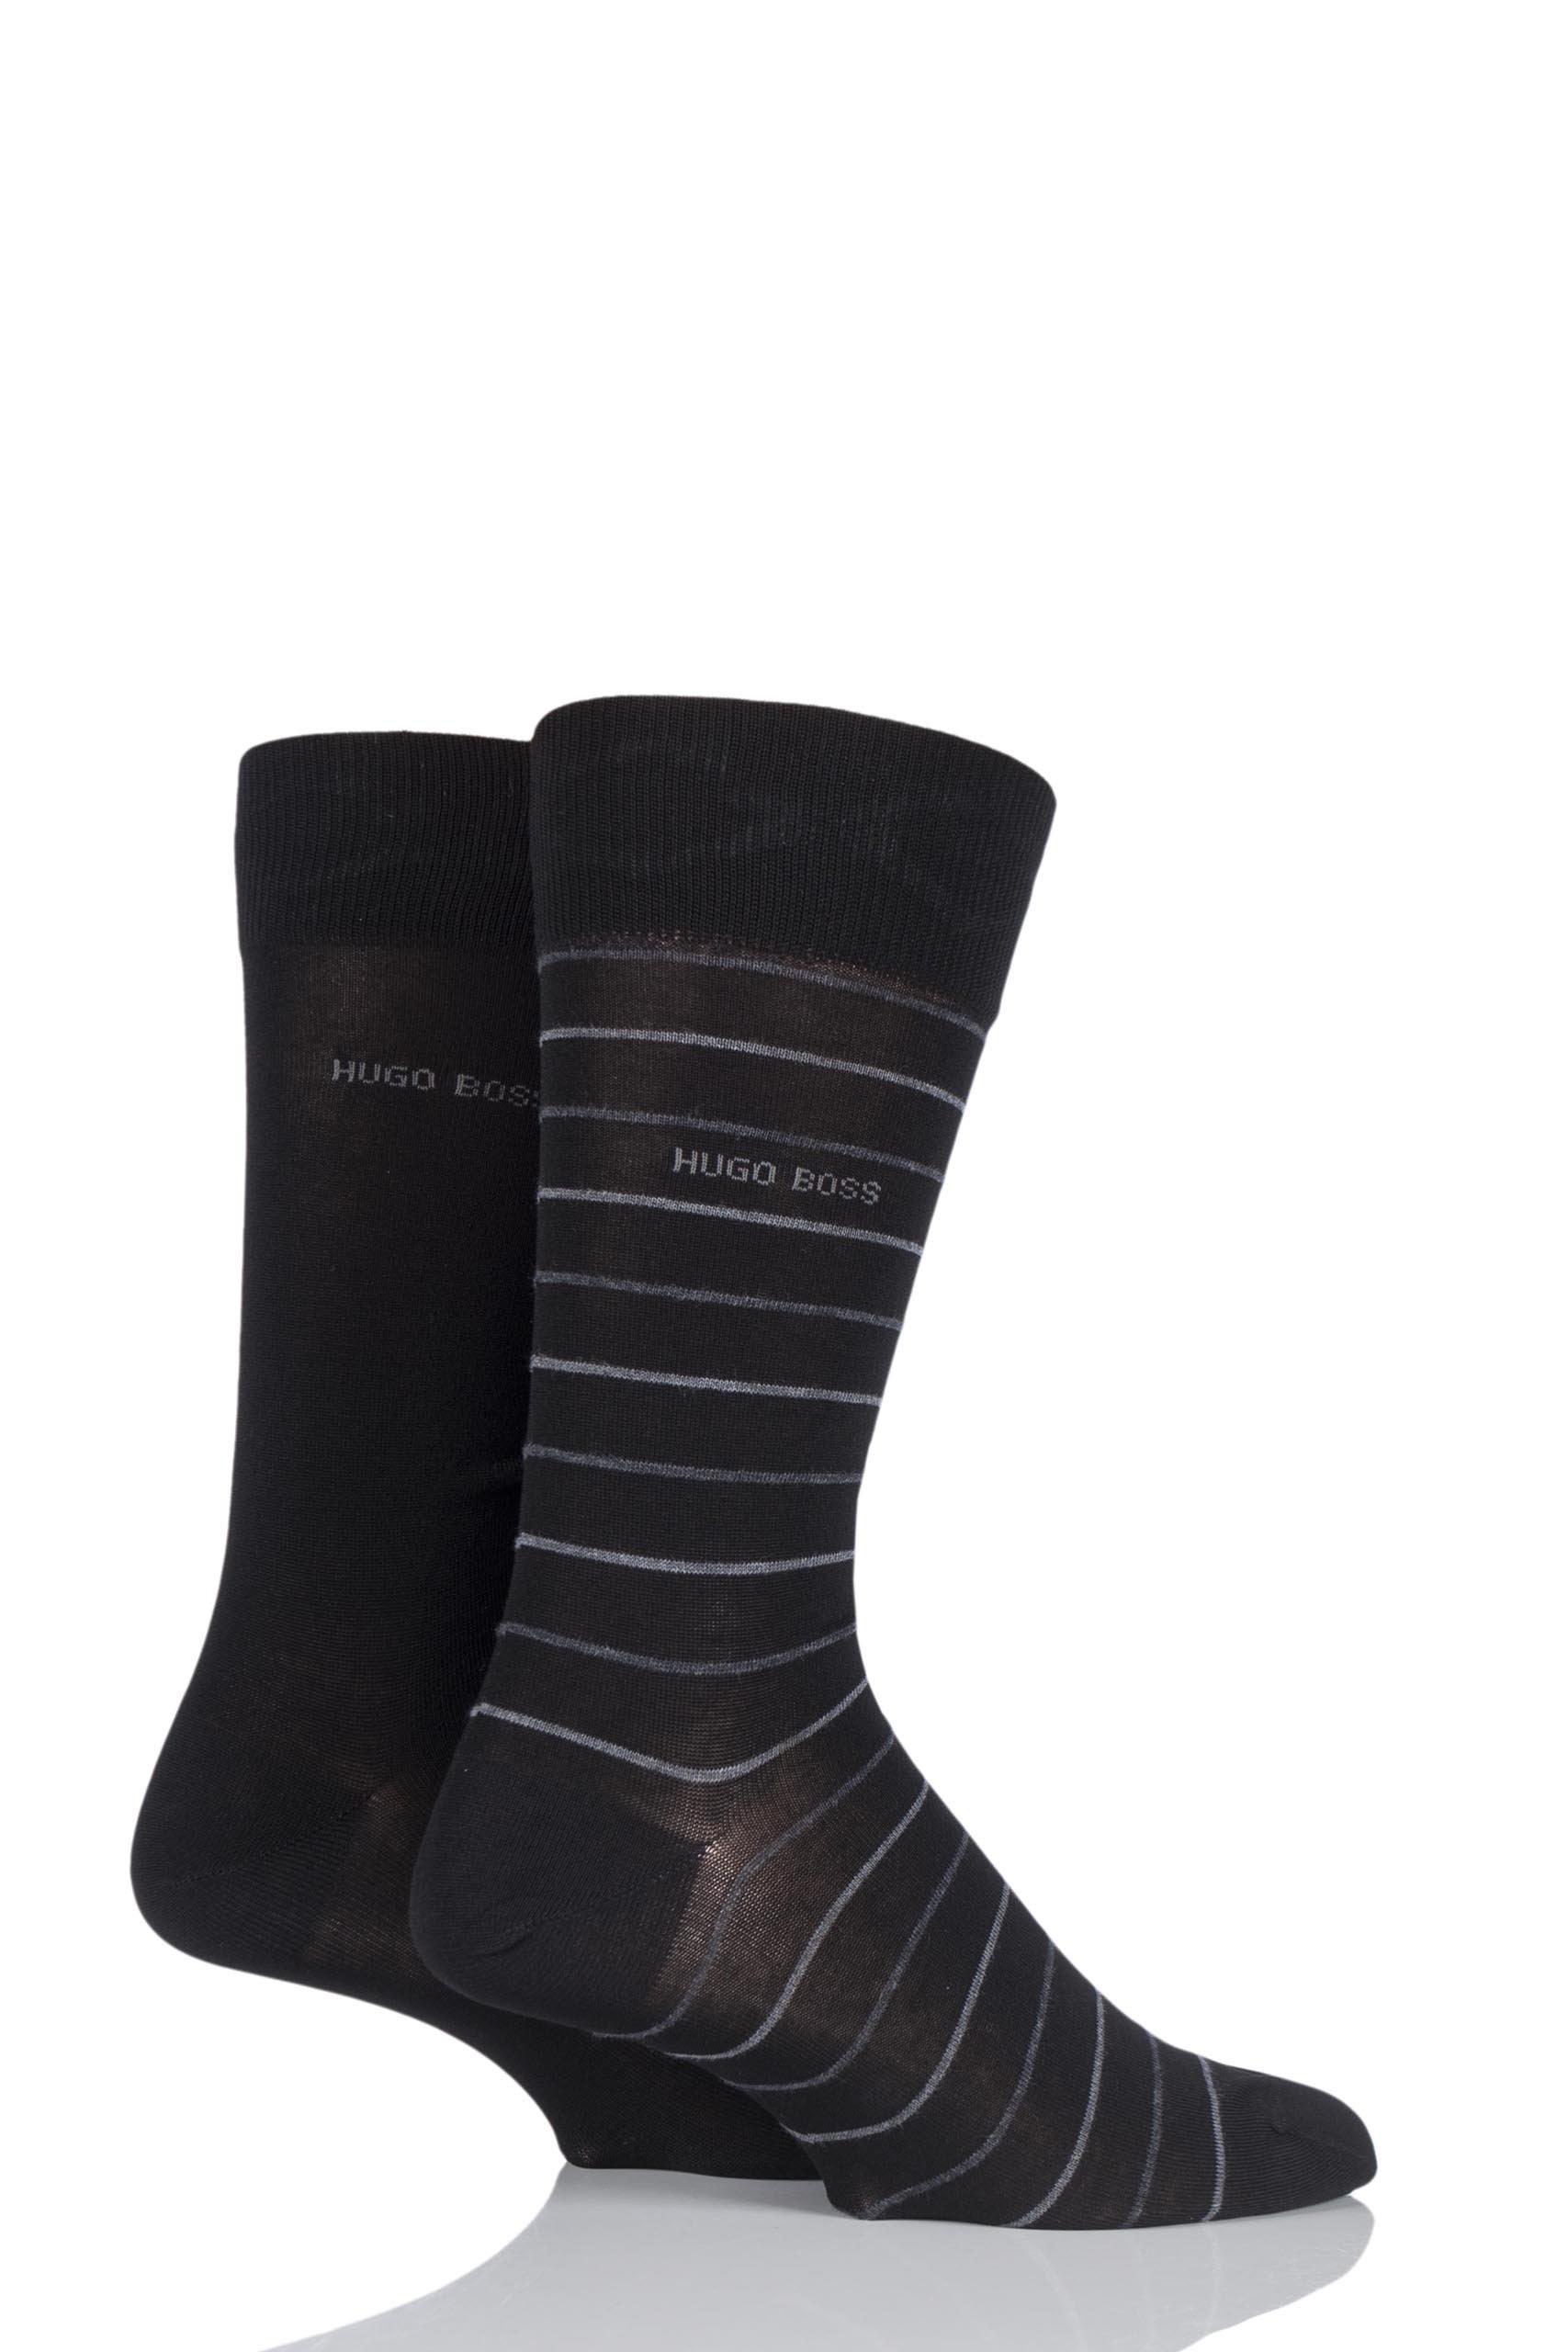 Mens 2 Pair Hugo Boss Fine Striped and Plain Mercerised Cotton Socks Black 8.5-11